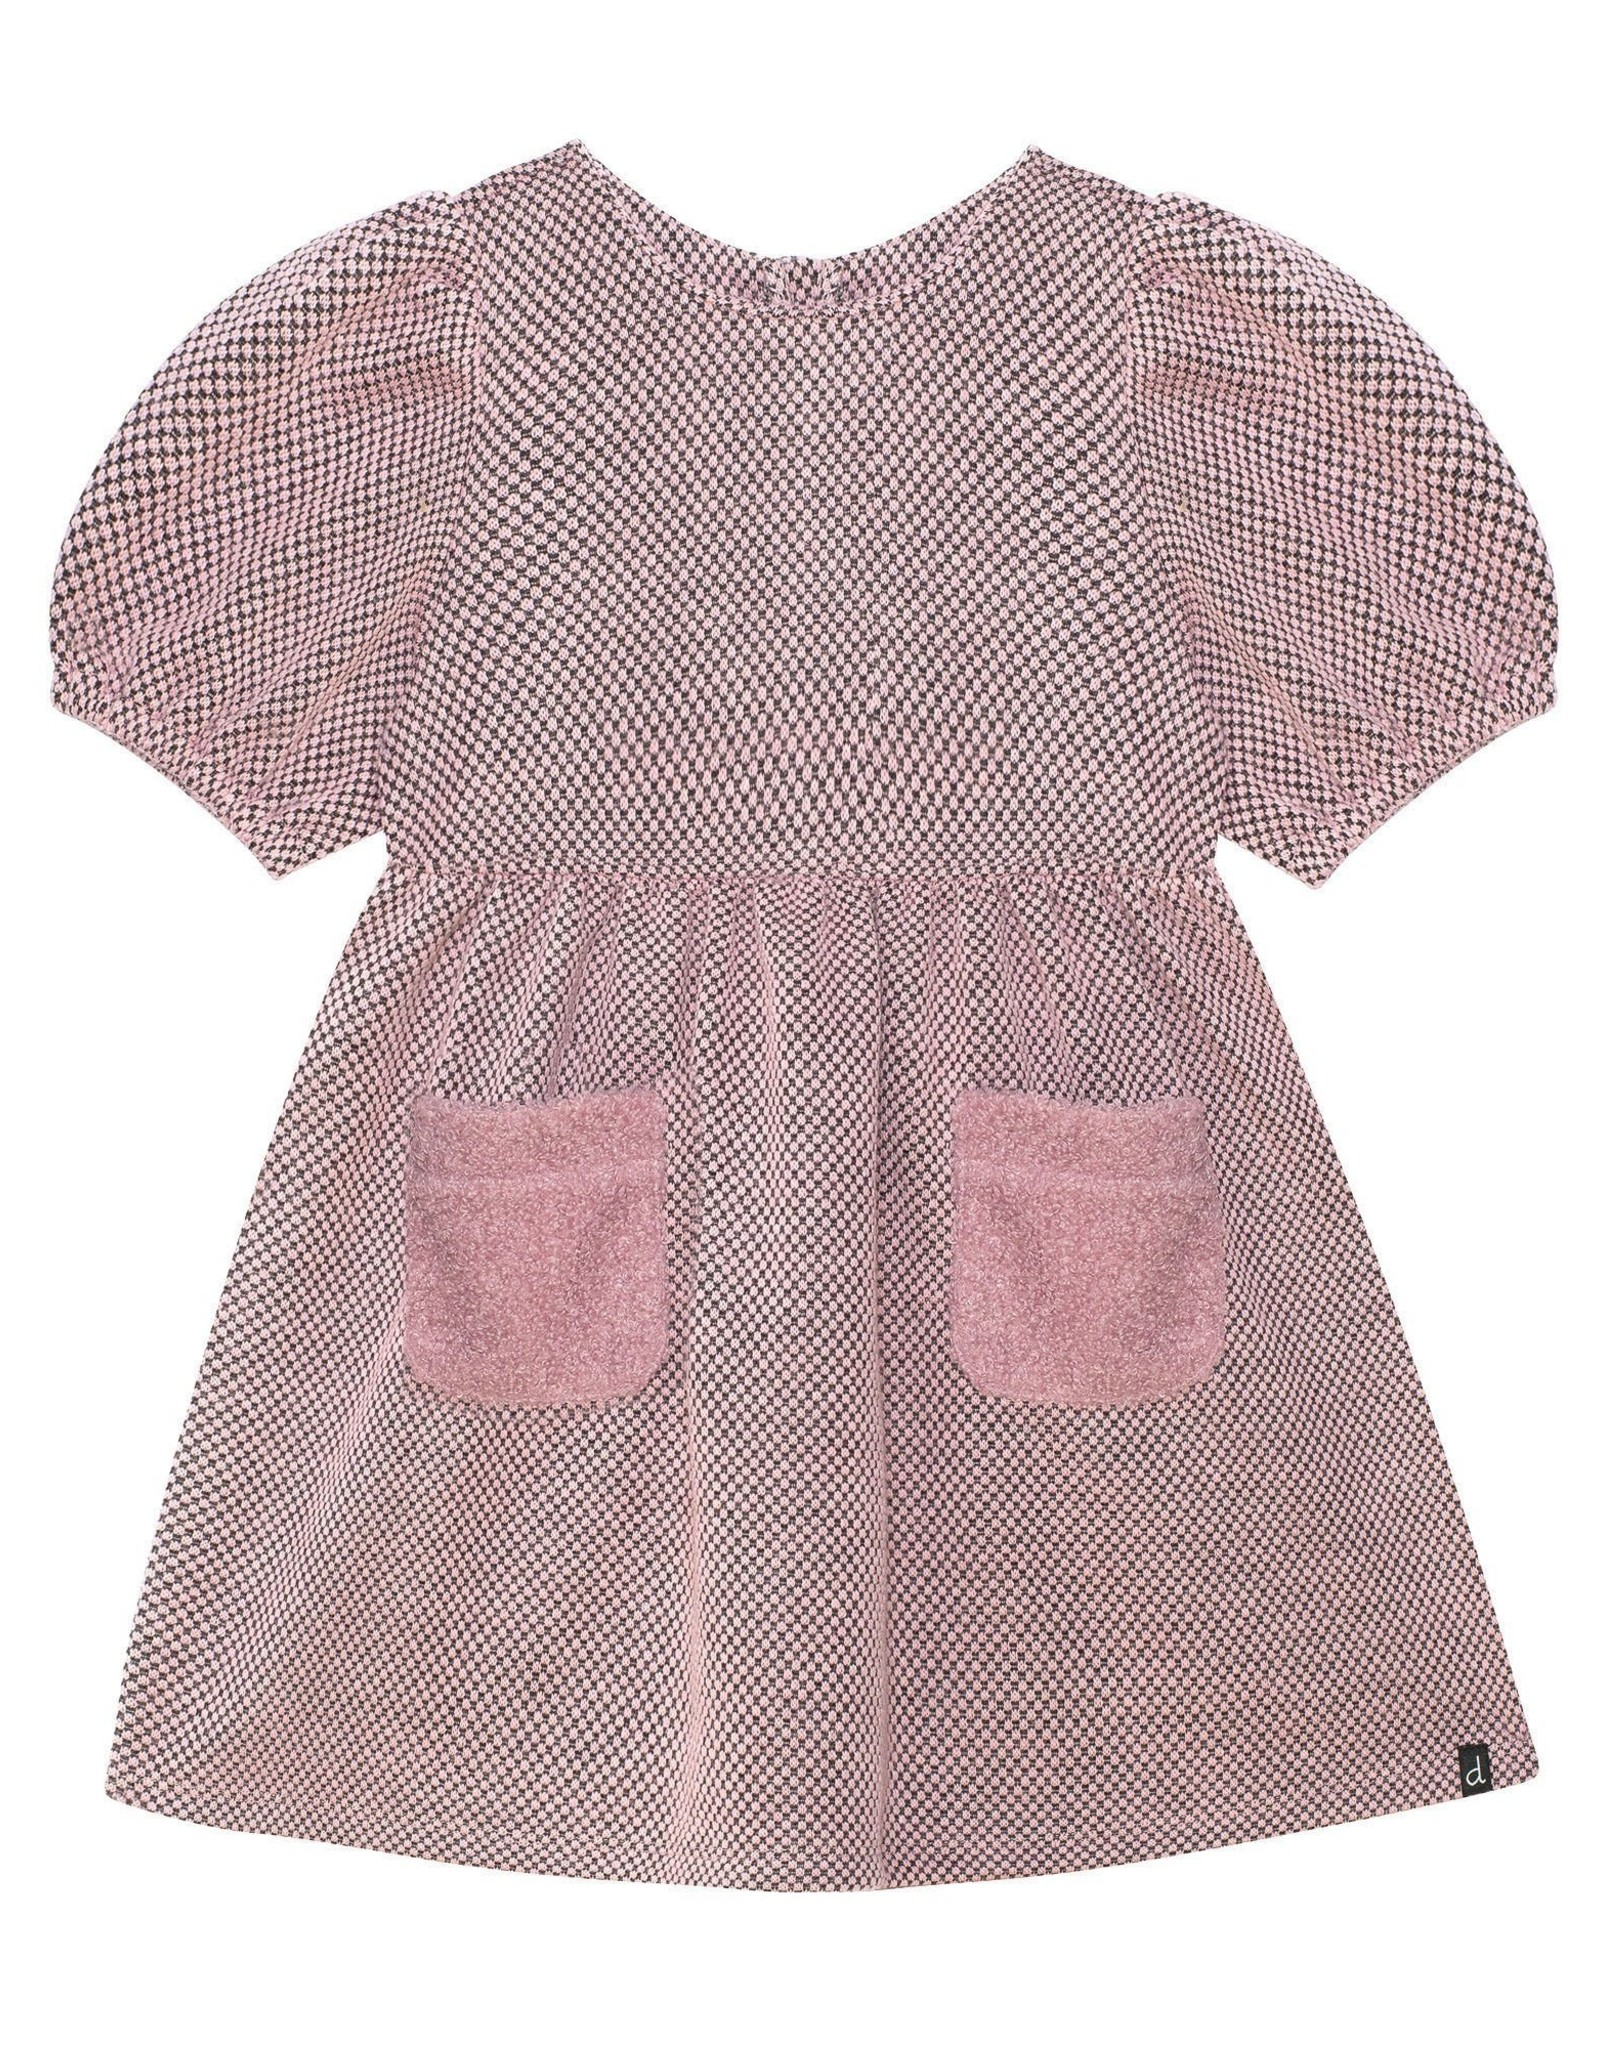 DeuxParDeux FA21 G Pink Dress w/Fur Pockets